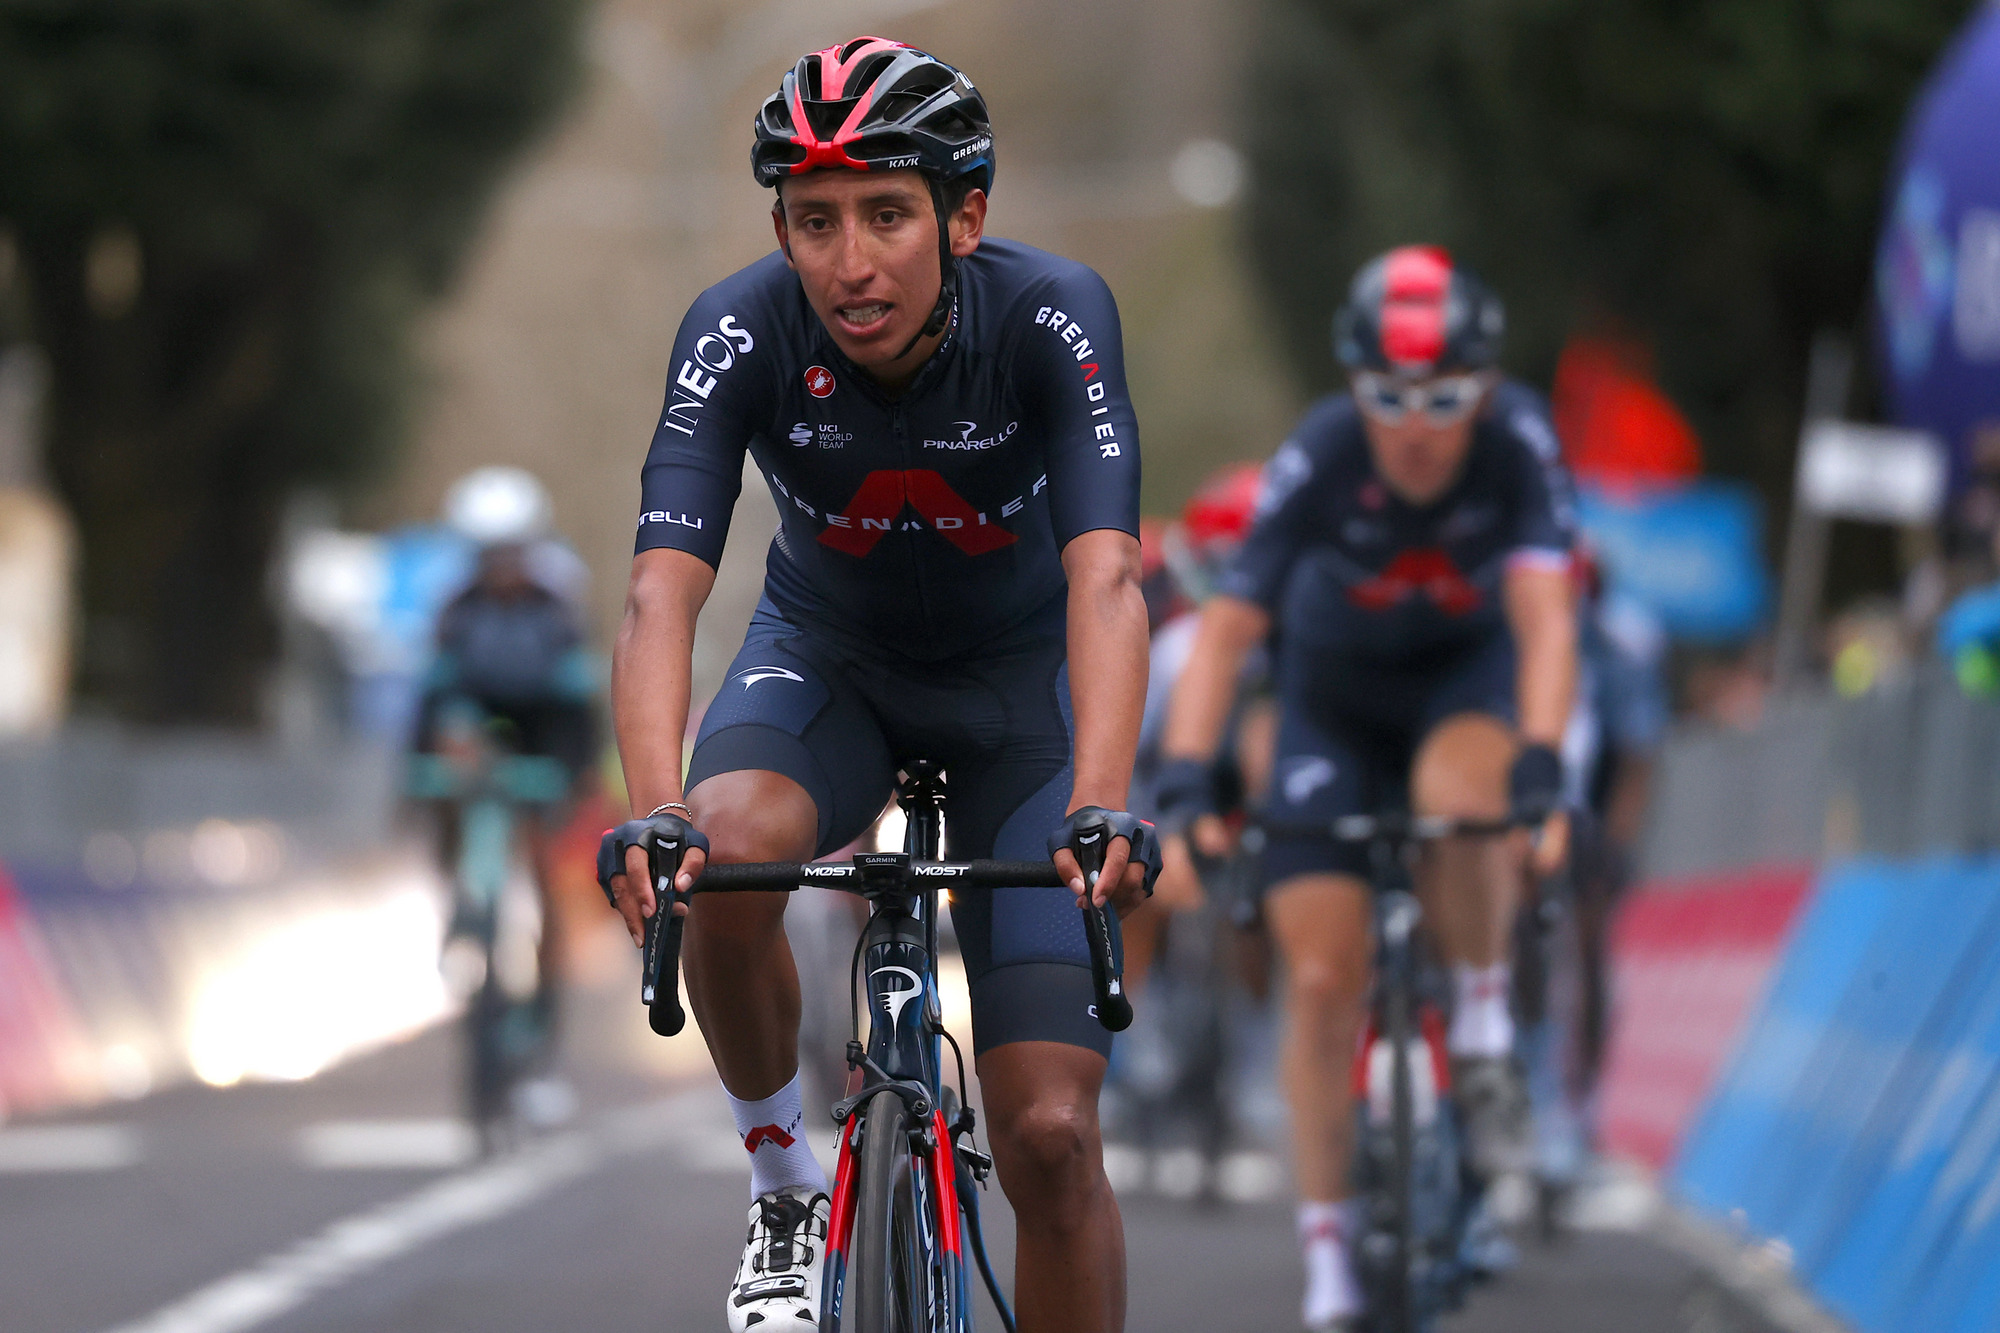 Tirreno Adriatico 2021 56th Edition 3rd stage Monticiano Gualdo Tadino 219 km 12032021 Egan Bernal COL Ineos Grenadiers photo Luca BettiniBettiniPhoto2021